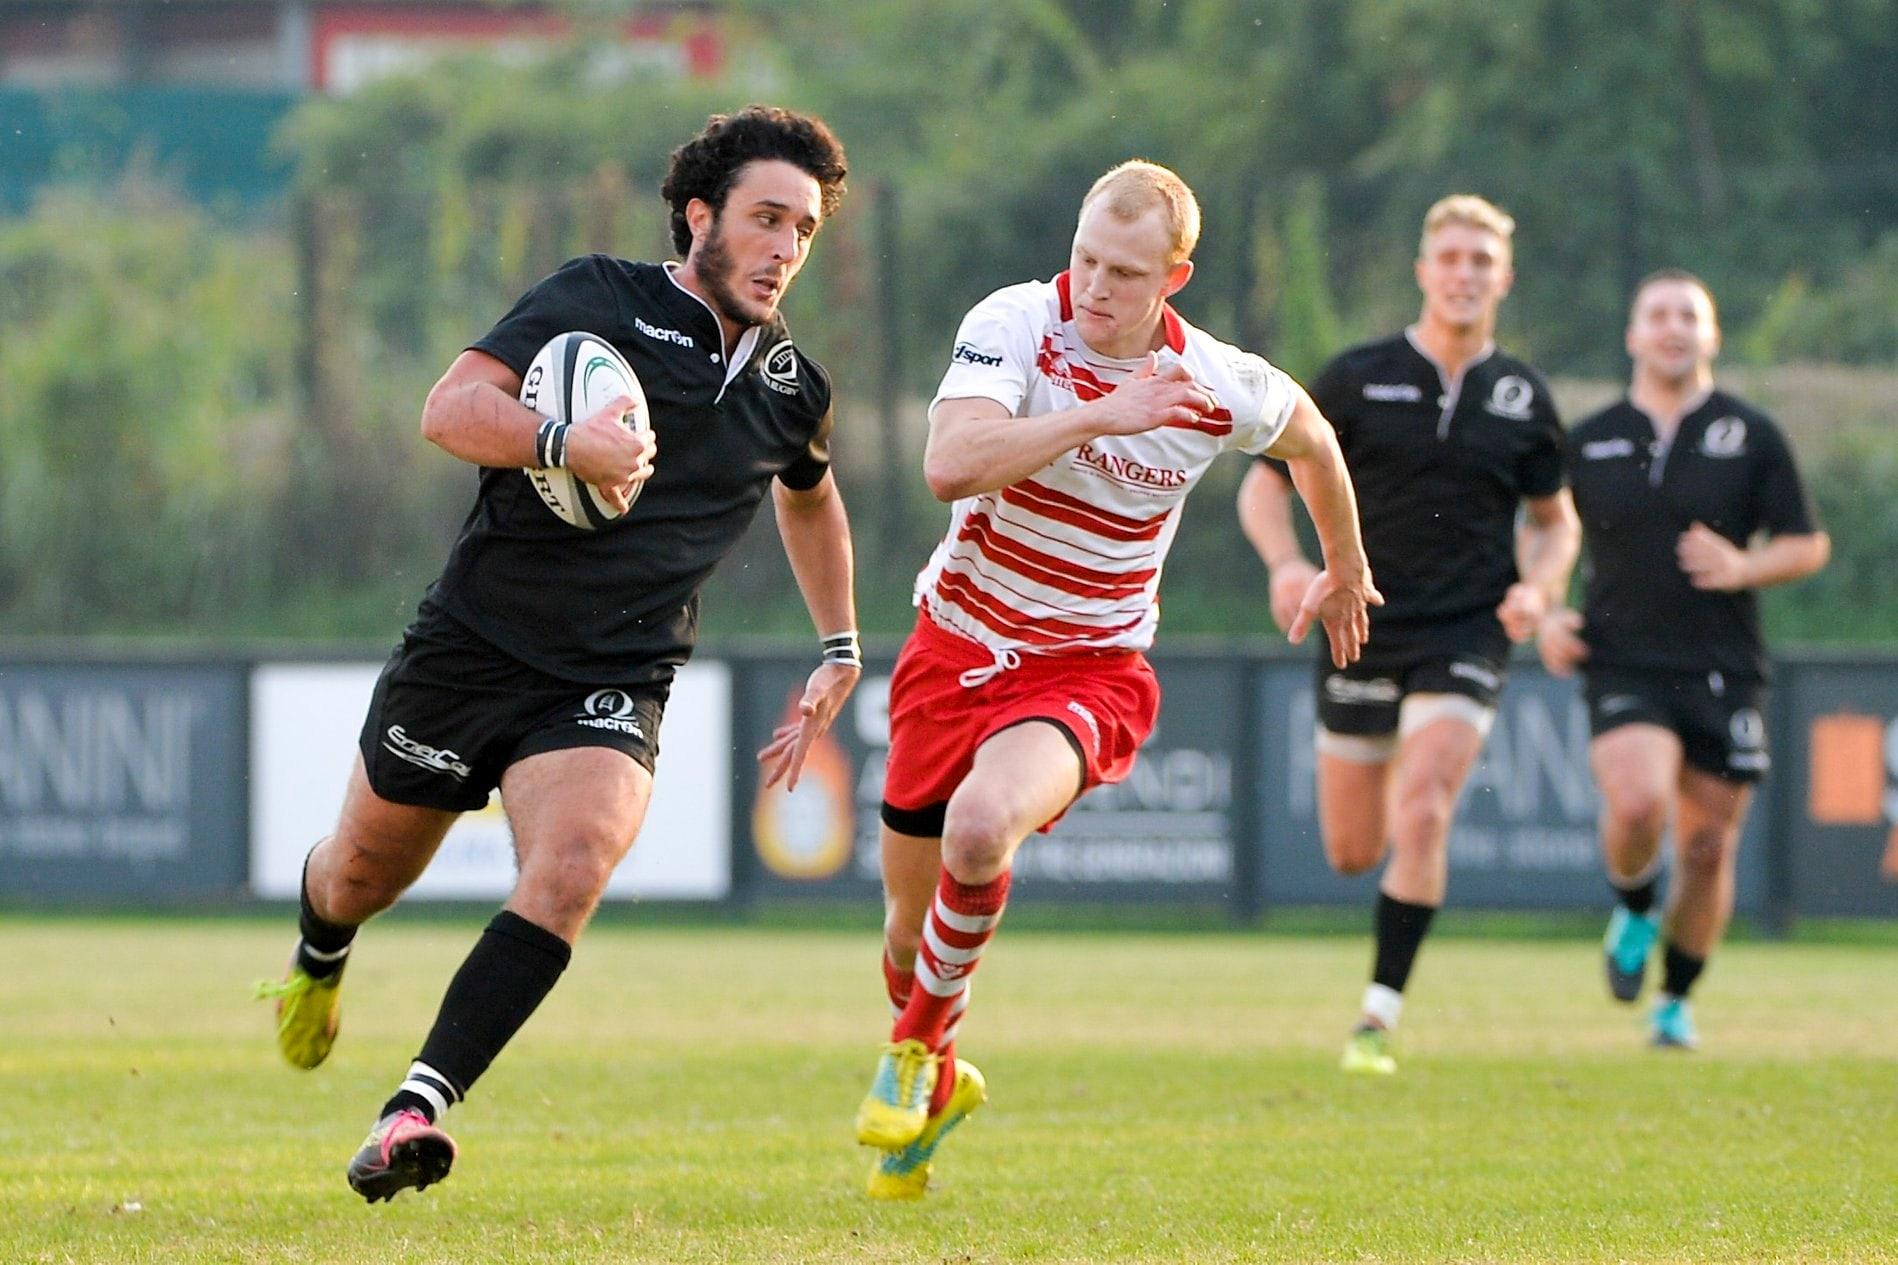 verona-rugby-rangers-vicenza-2